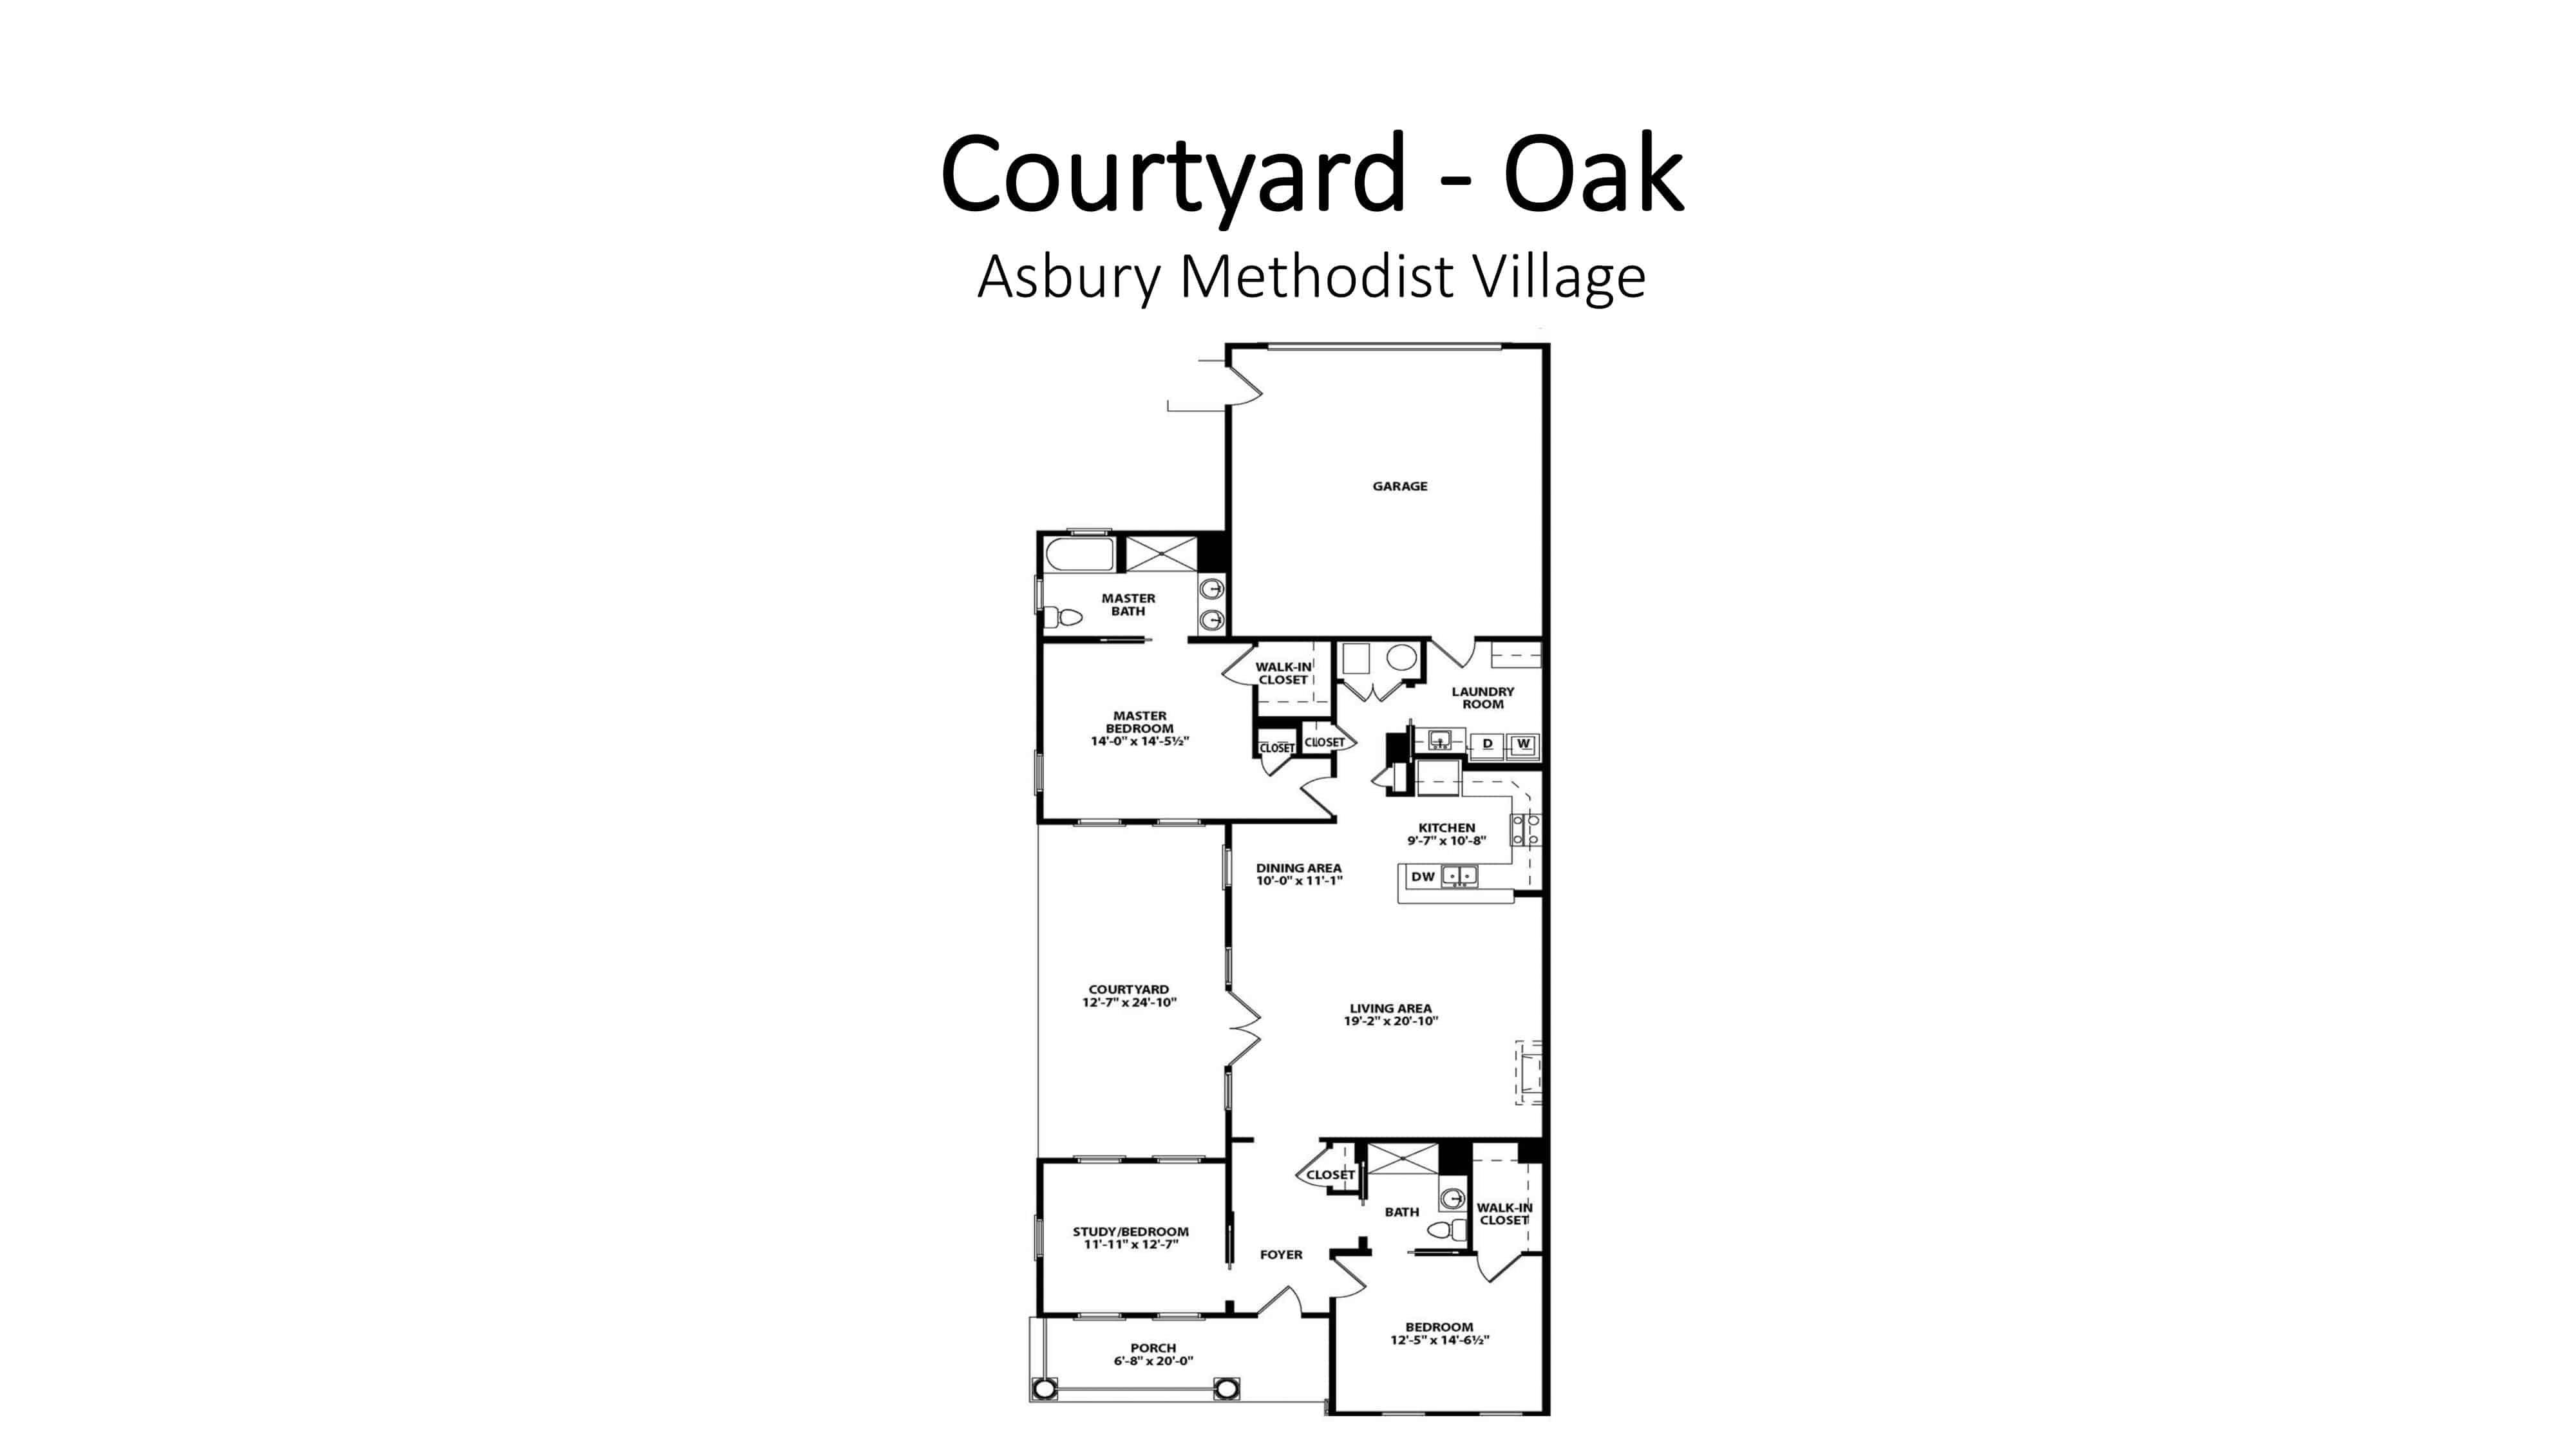 Asbury Methodist Village Courtyard - Oak